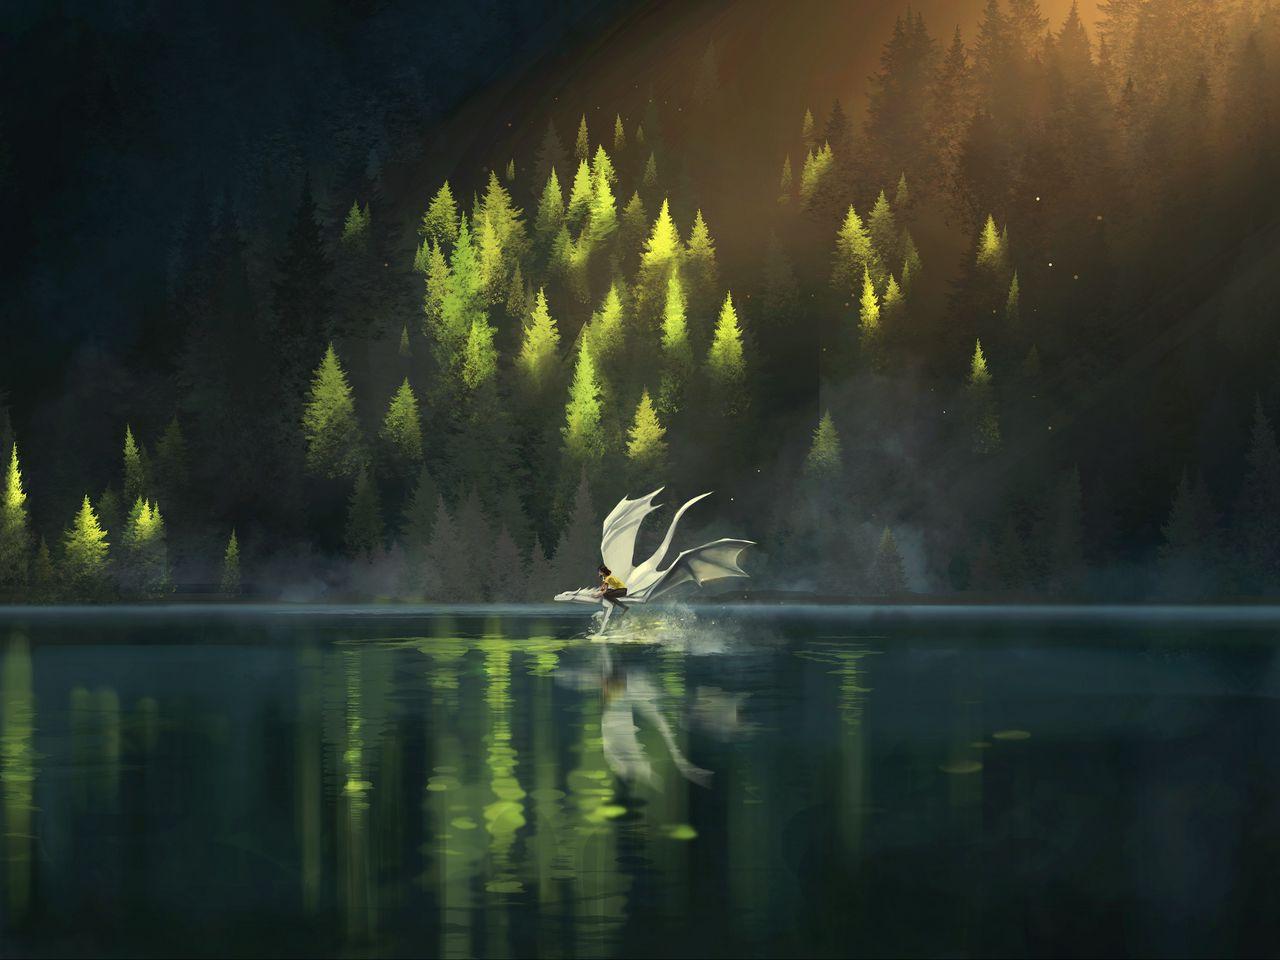 1280x960 Wallpaper dragon, friends, fantasy, art